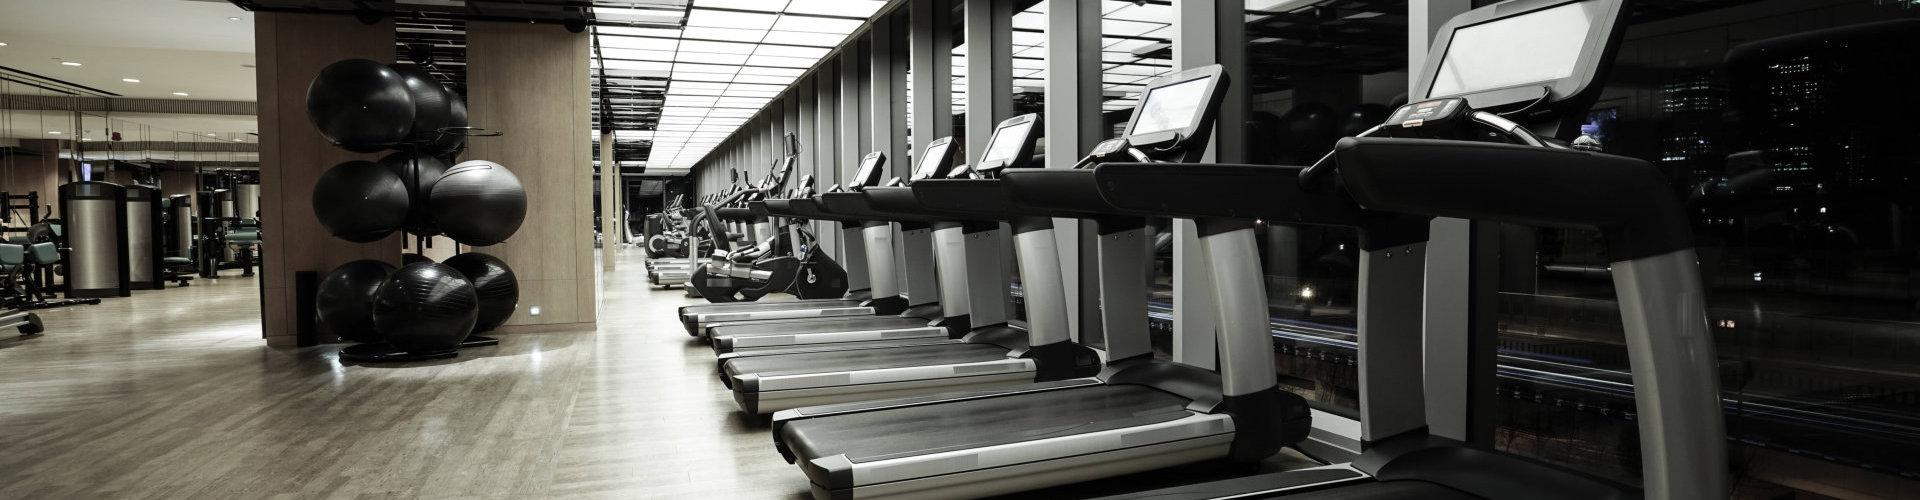 indoor image of a gym